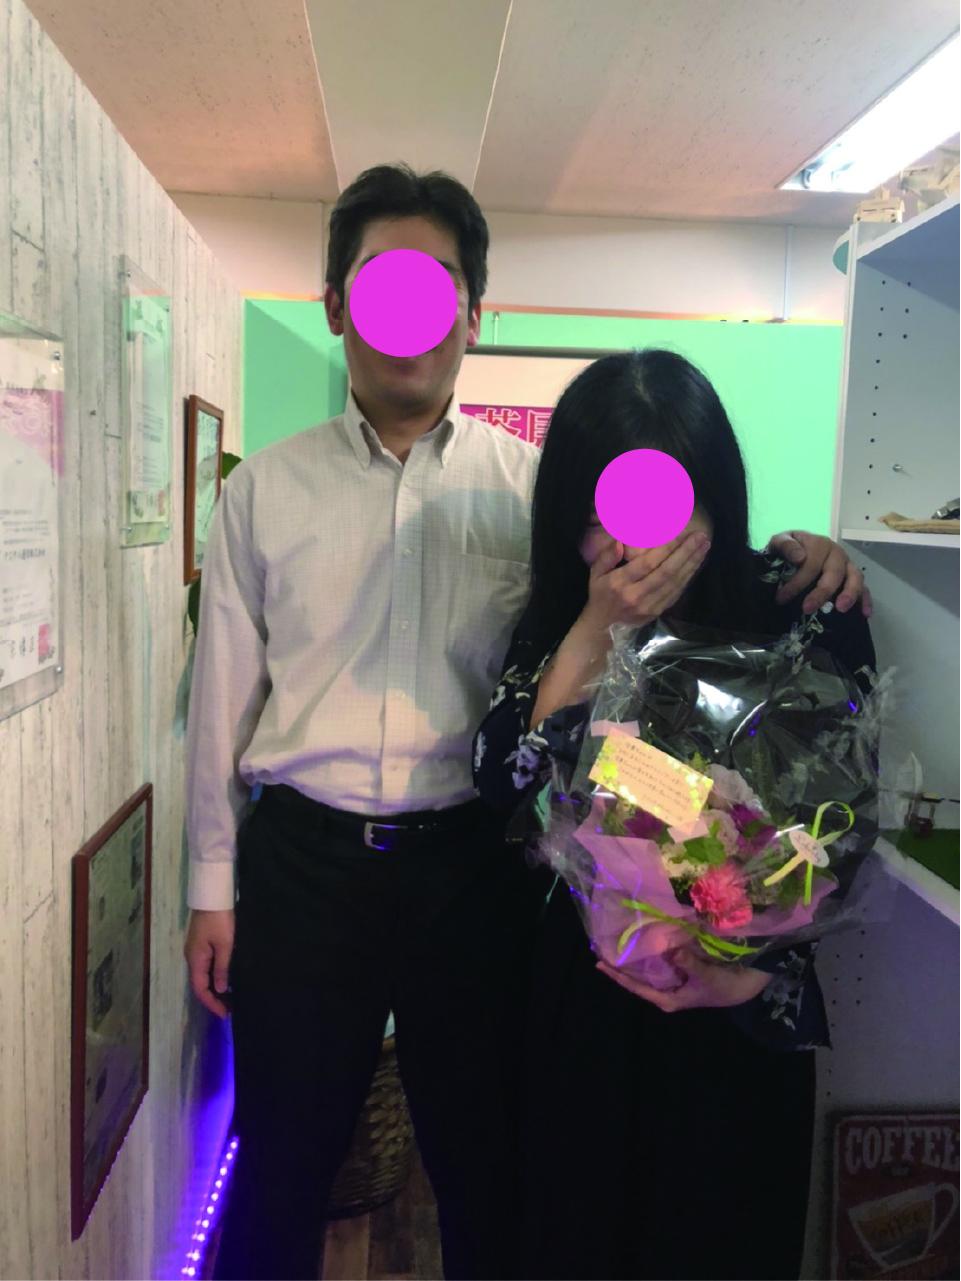 fukuoka-lp2_20210527_4-art-4-80